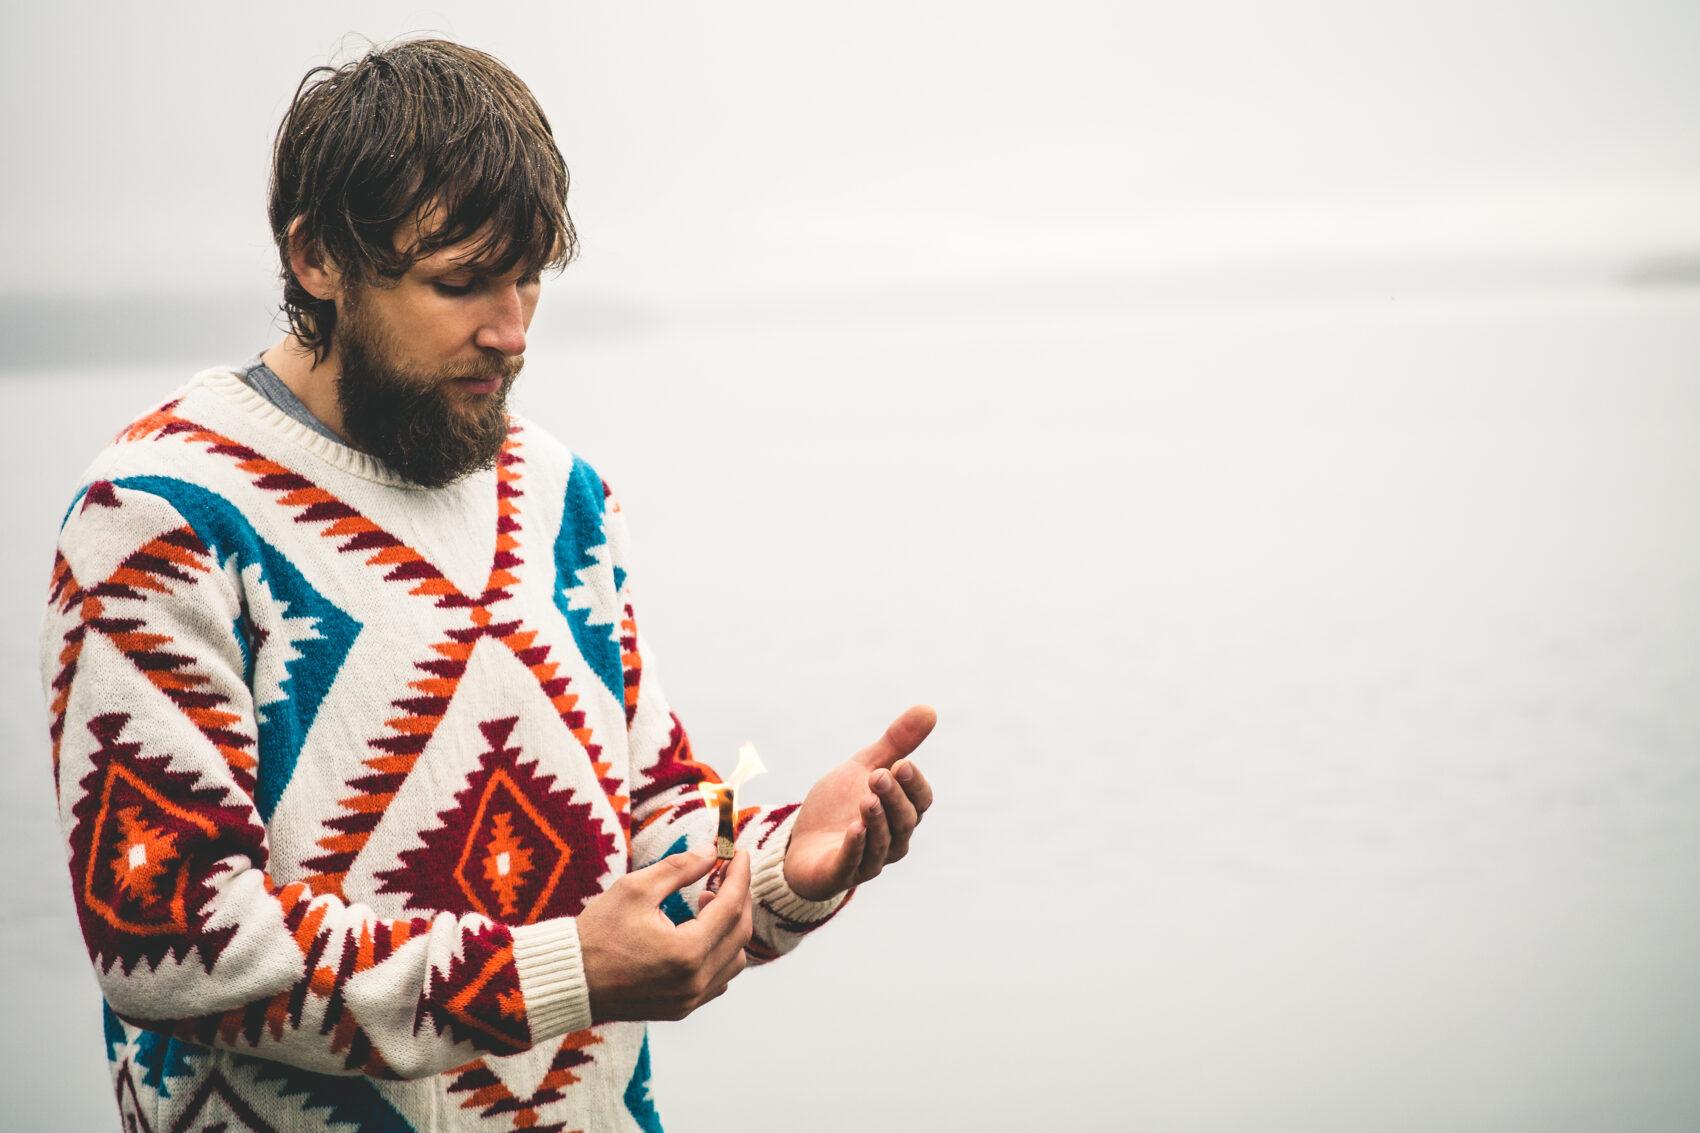 Man bearded holding fire